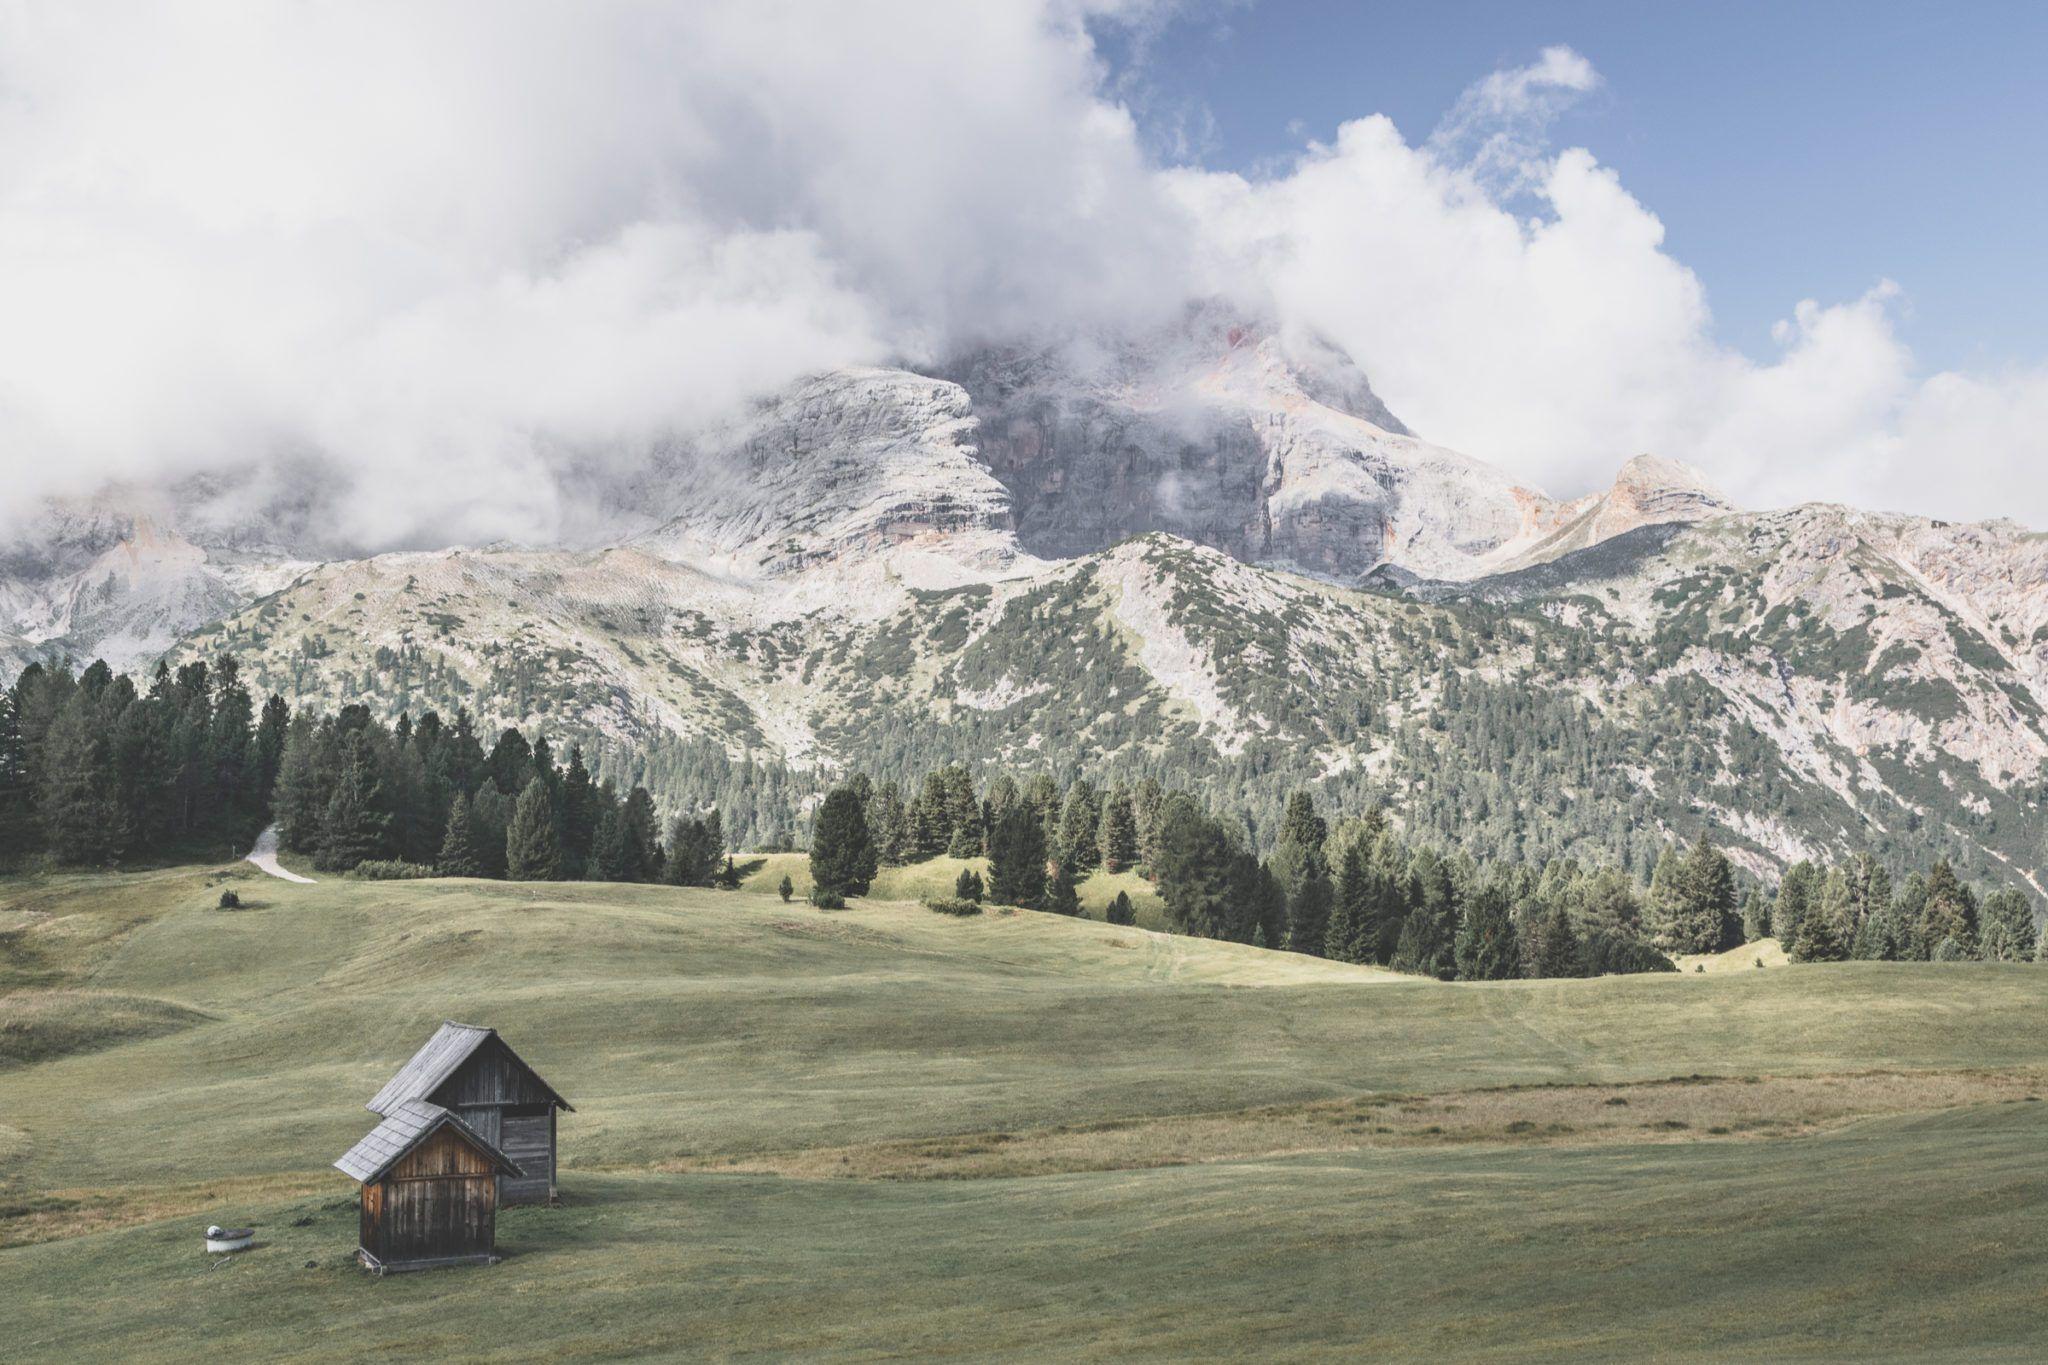 prato piazza, magnifique alpage des dolomites italiennes